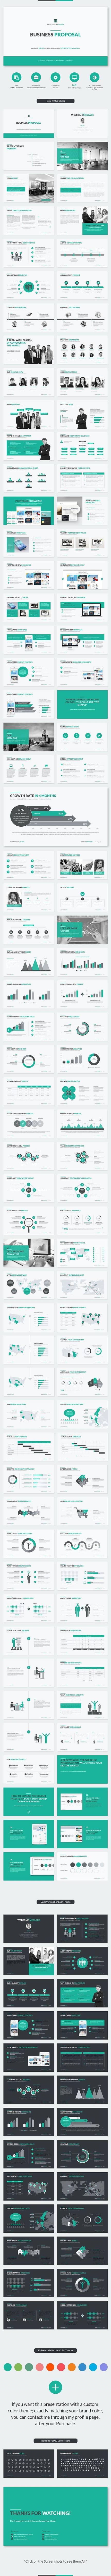 Business Proposal Keynote Template #design #slides Download: http://graphicriver.net/item/business-proposal-keynote-template/12656364?ref=ksioks